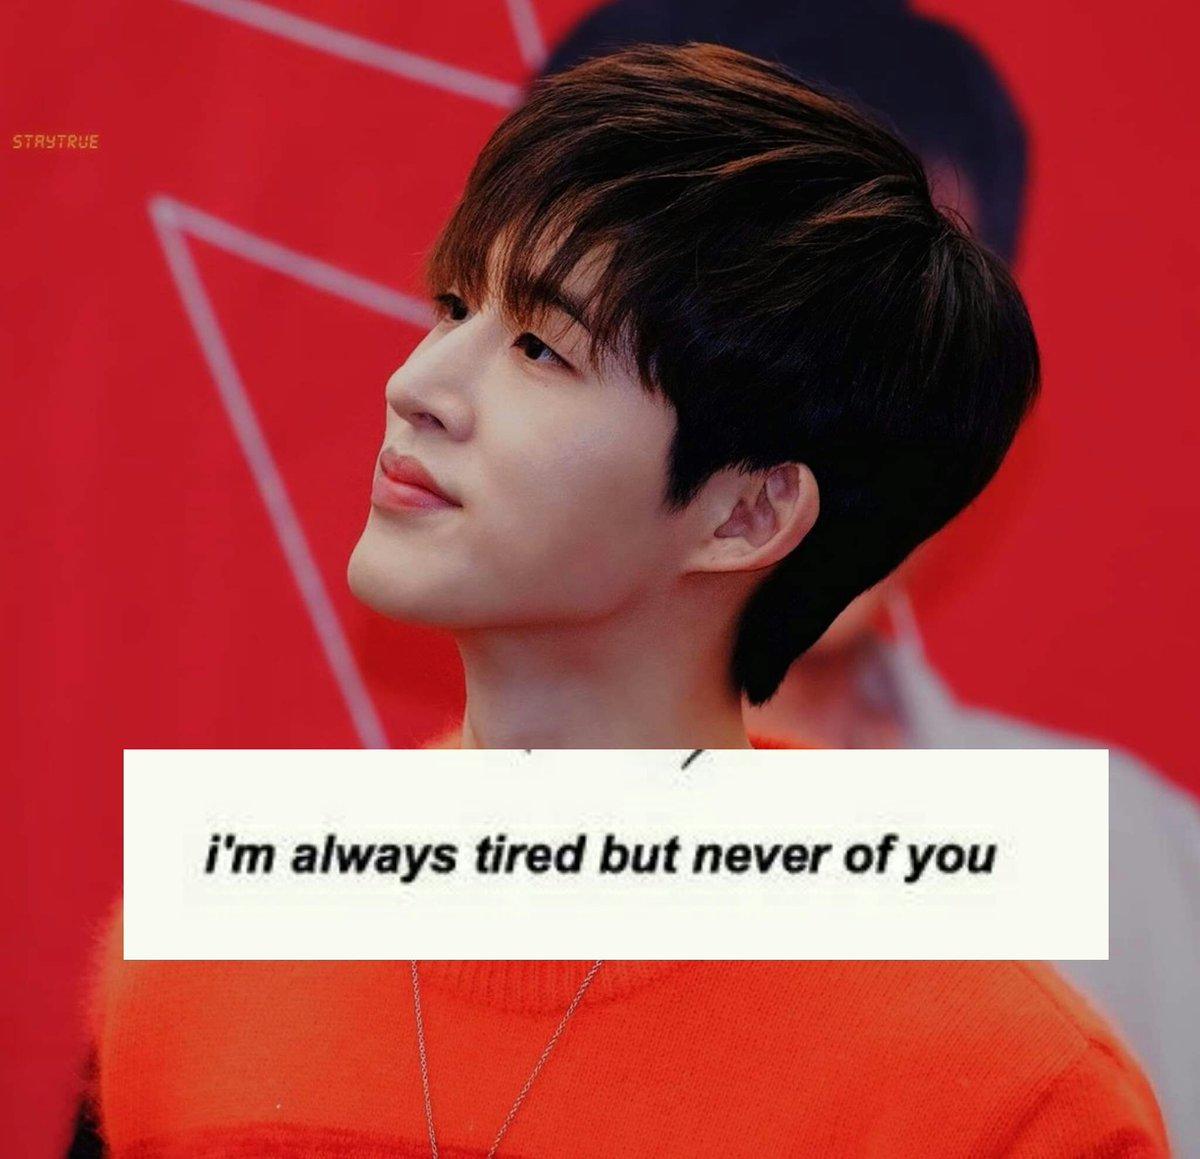 I'll never get tired of you! #AlwaysBIyourSide #AlwaysBIyourSide #AlwaysBIyourSide #AlwaysBIyourSide #AlwaysBIyourSide #AlwaysBIyourSide<br>http://pic.twitter.com/or5txmGd98